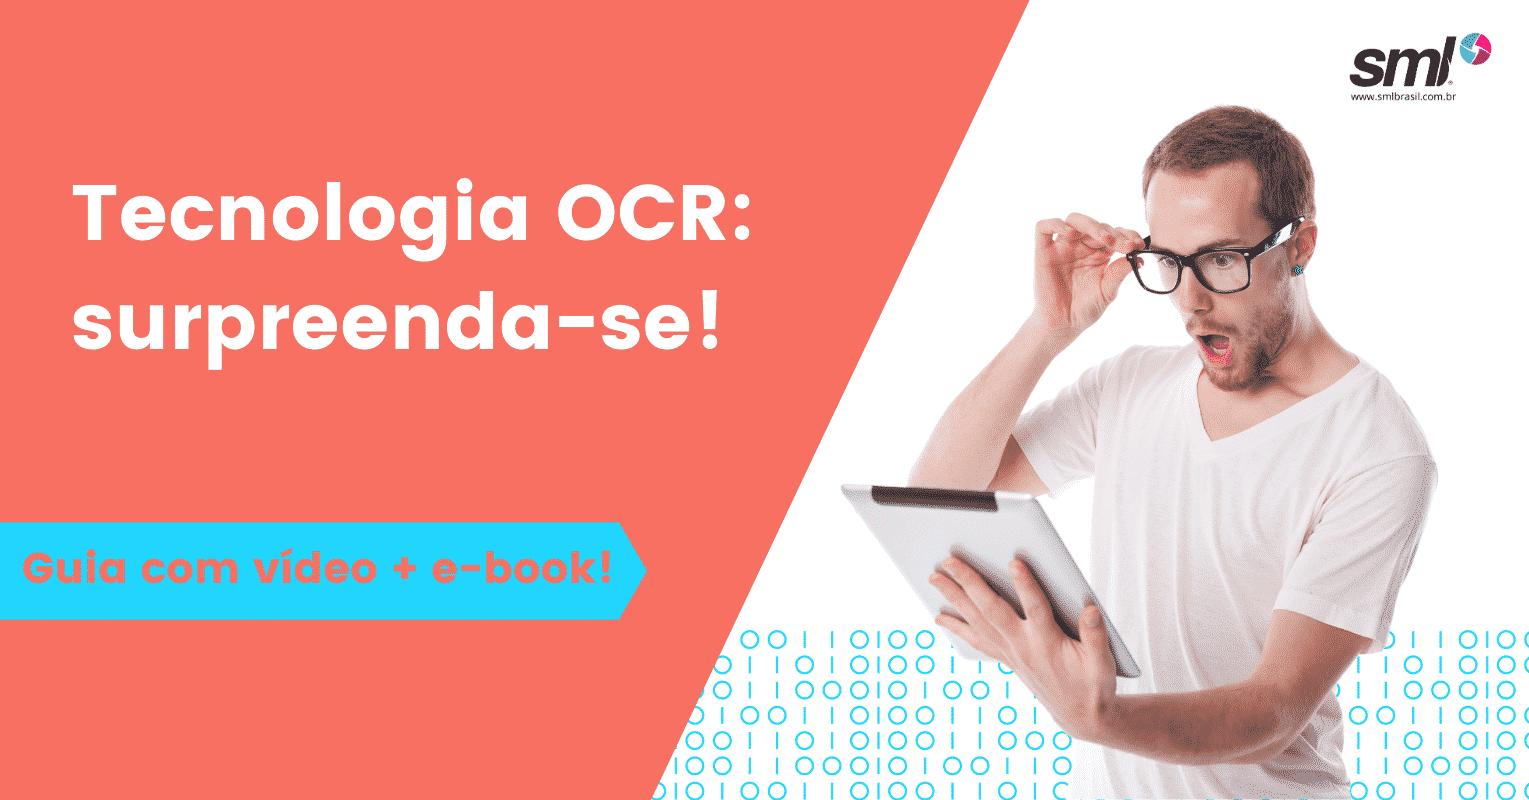 Guia completo da tecnologia OCR